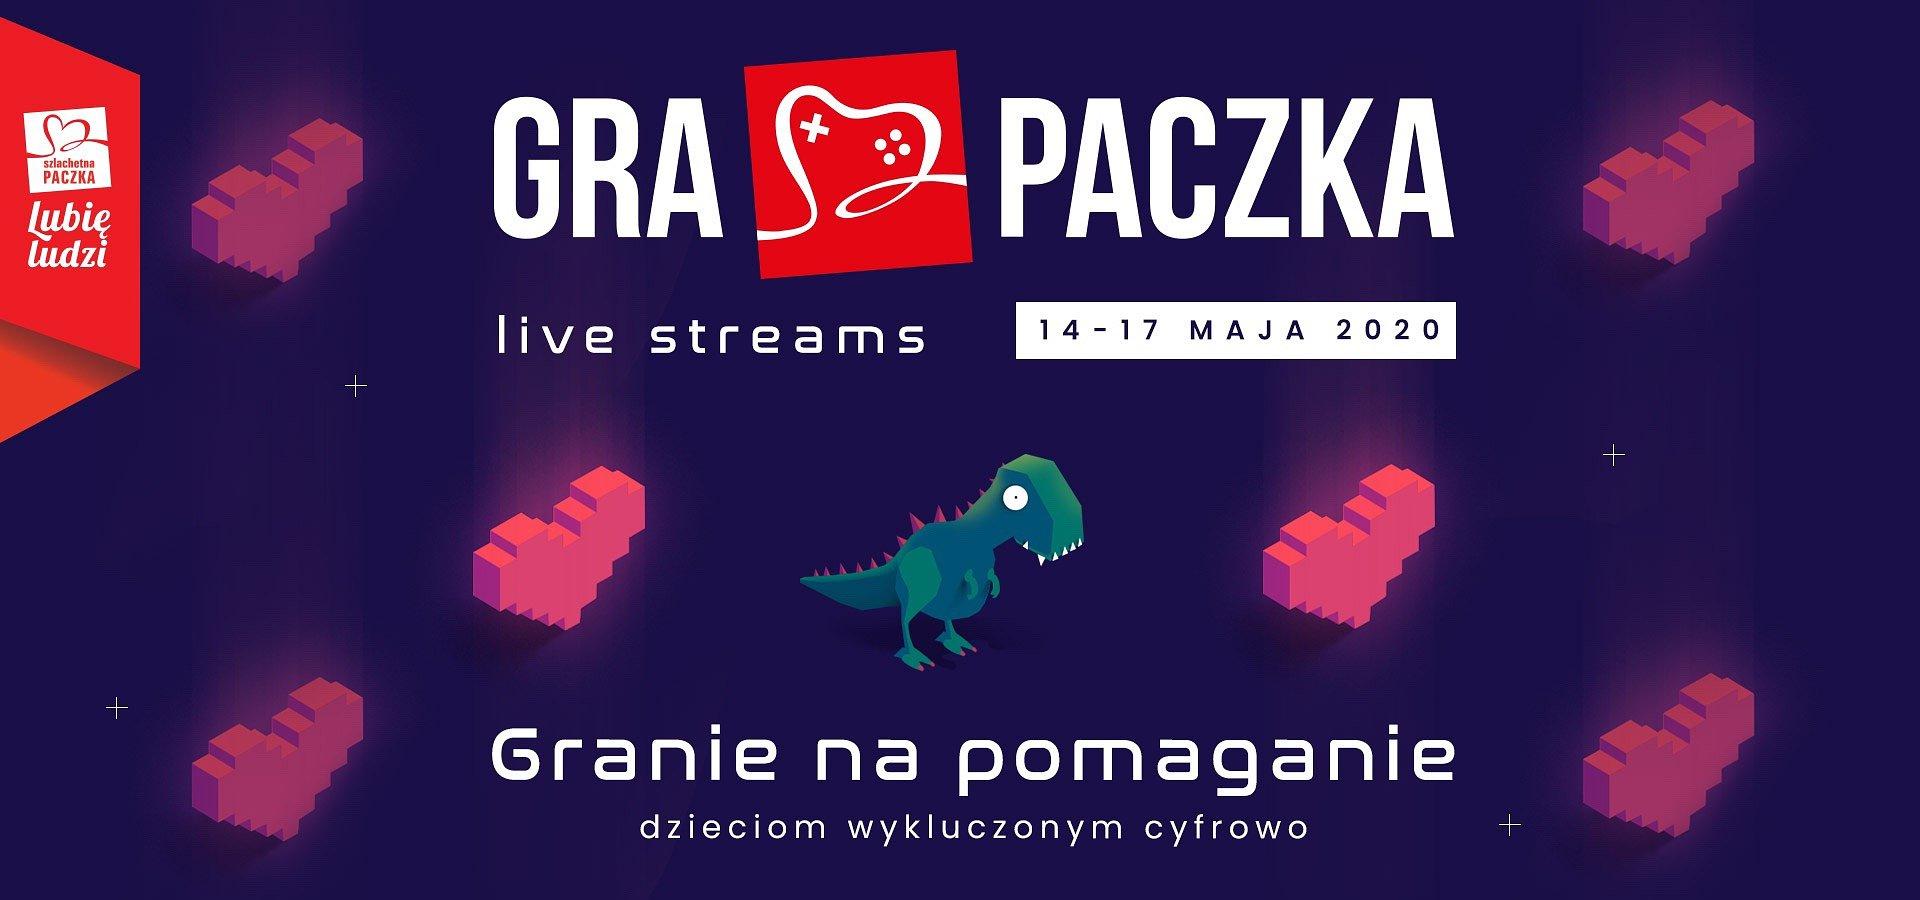 Komputronik Gaming i Fundacja Komputronik partnerami akcji Gra Paczka